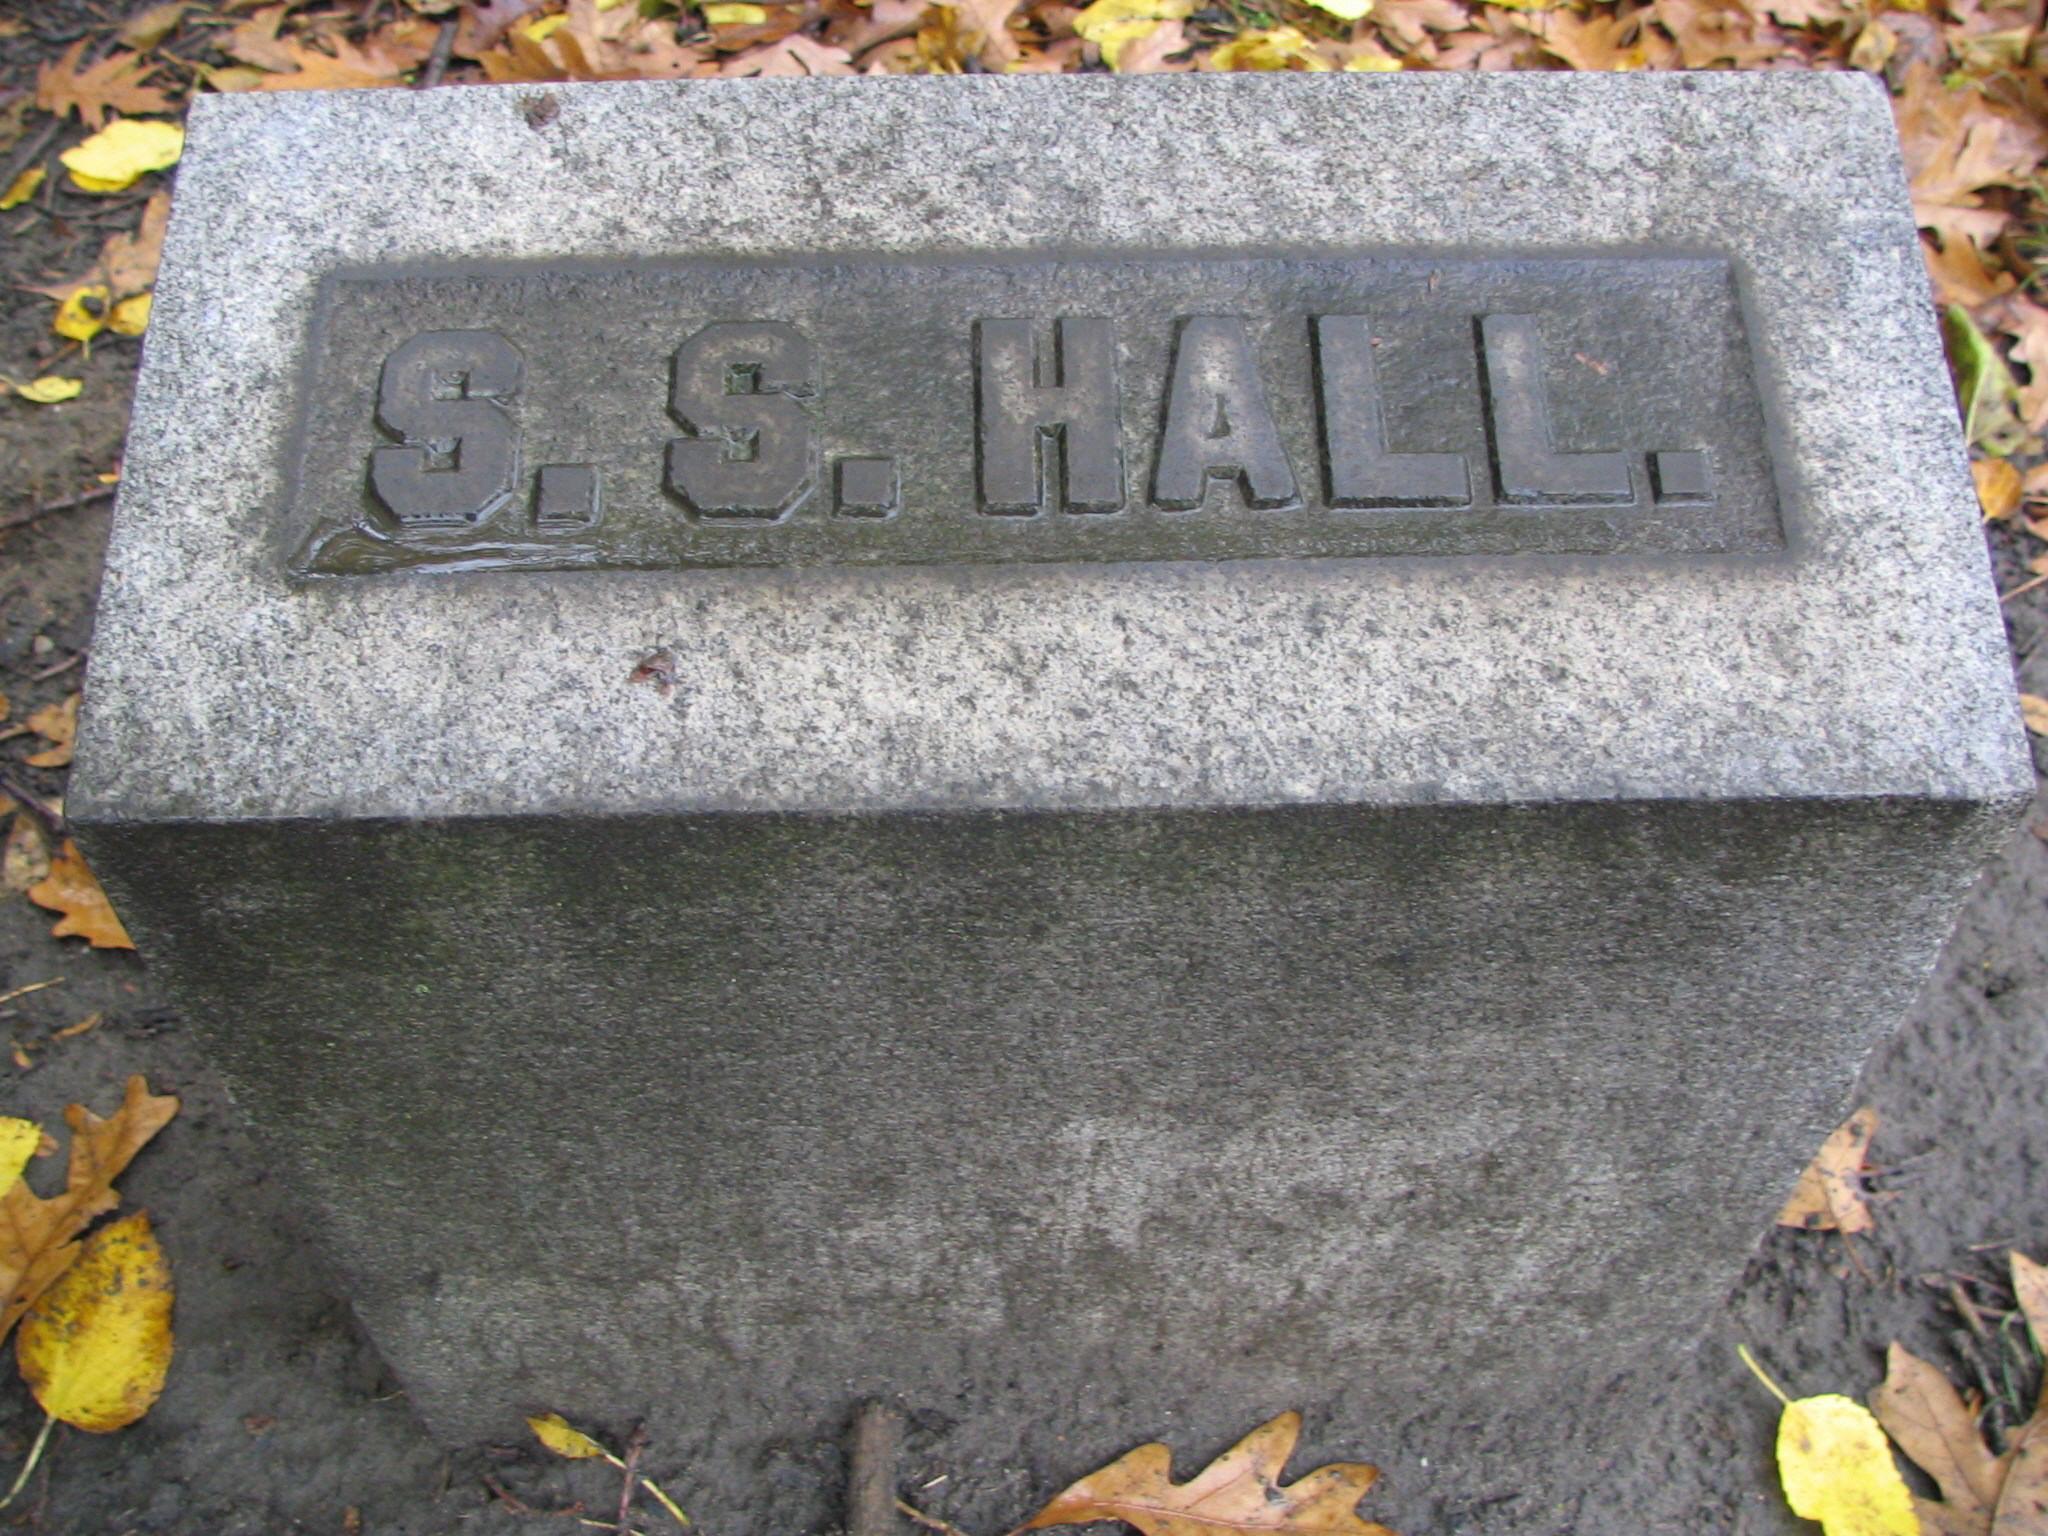 Sibyl Hall